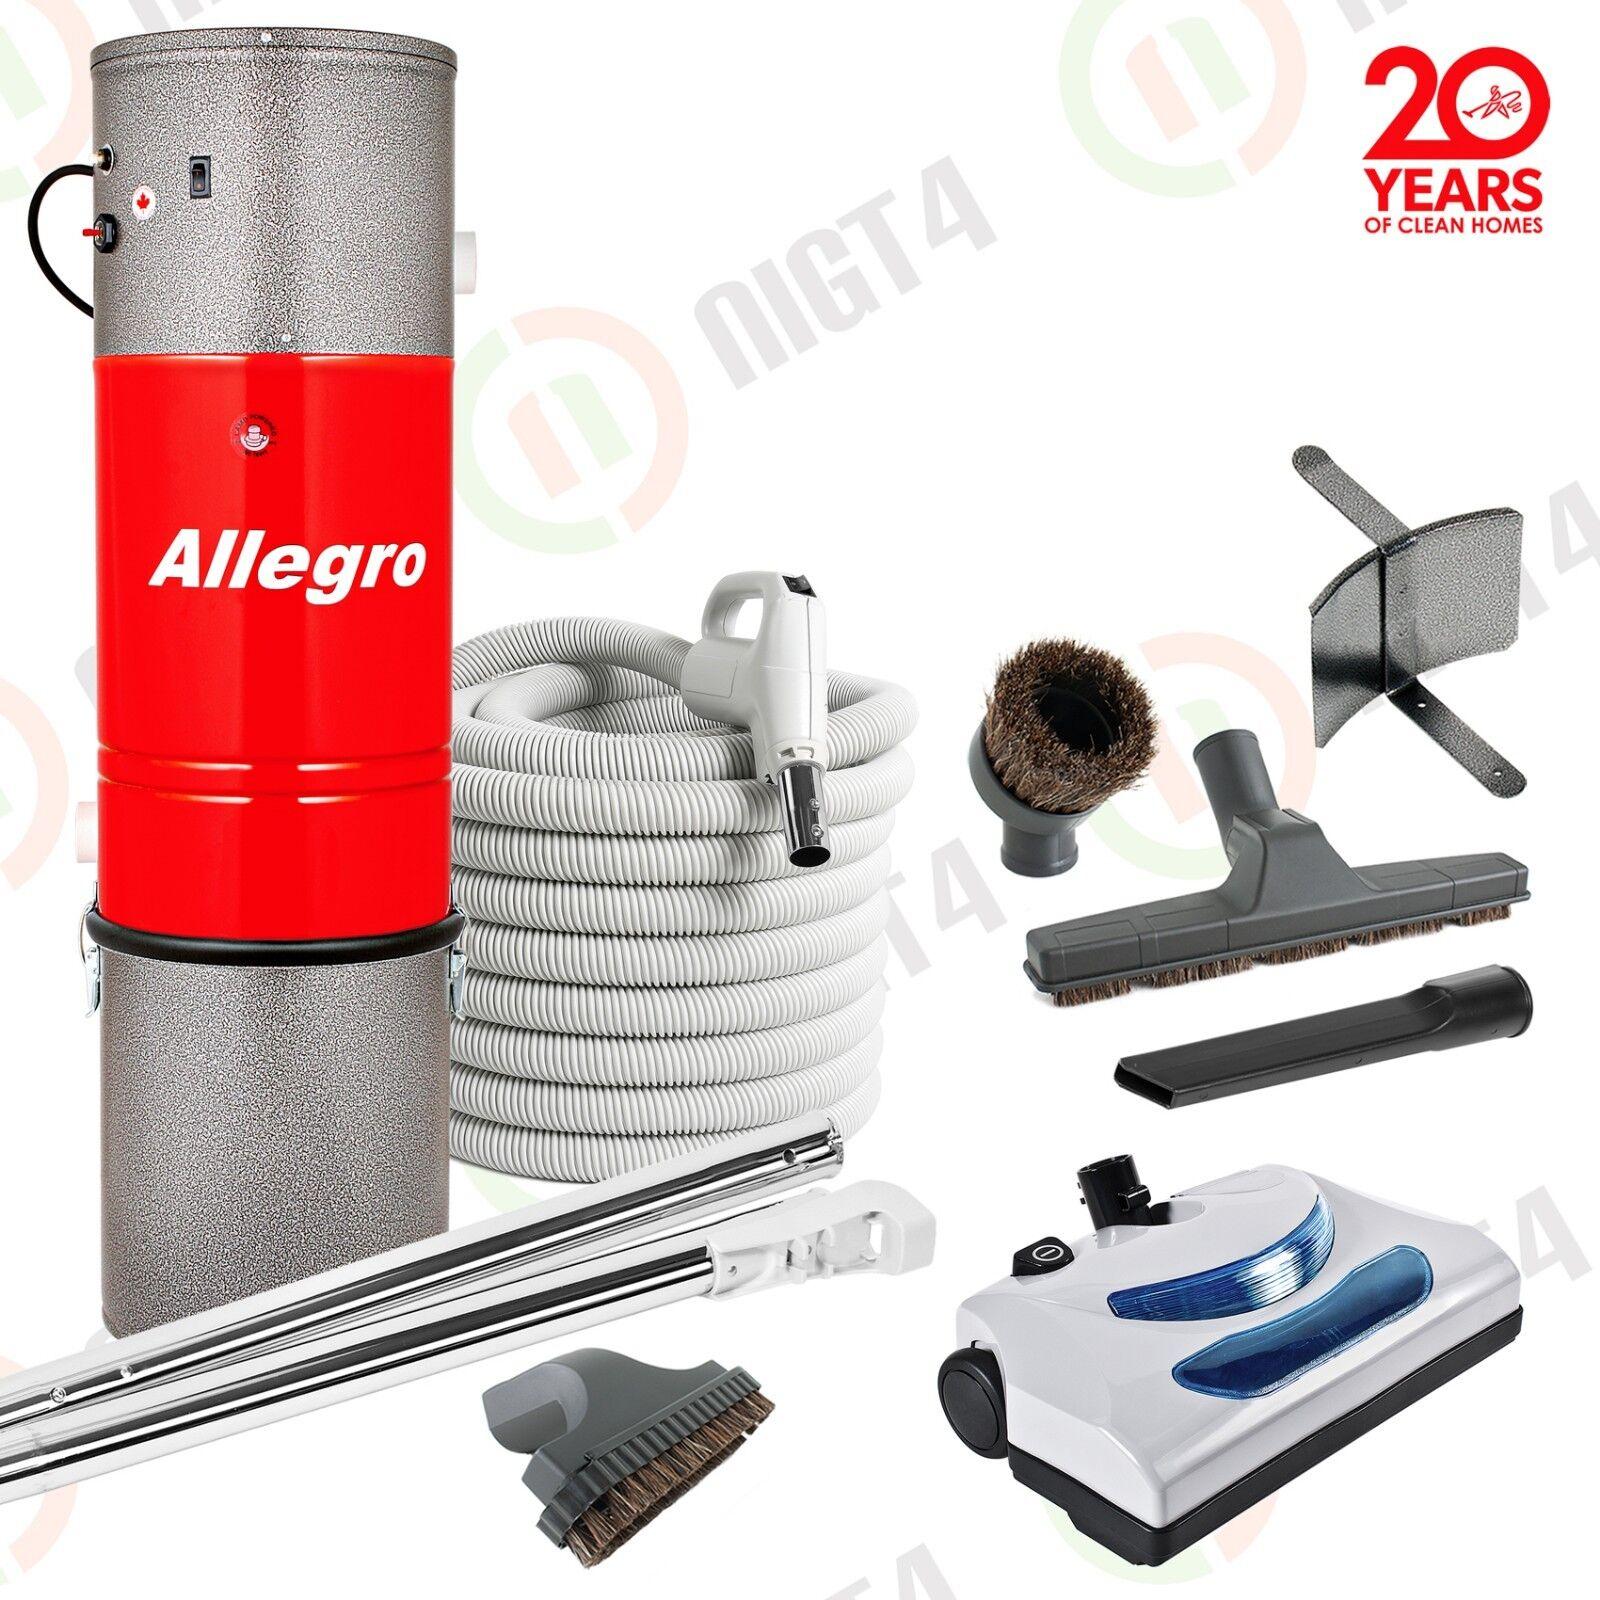 New Allegro Central Vacuum 3,000 sq feet - 30' Hose Electrolux Powerhead Kit